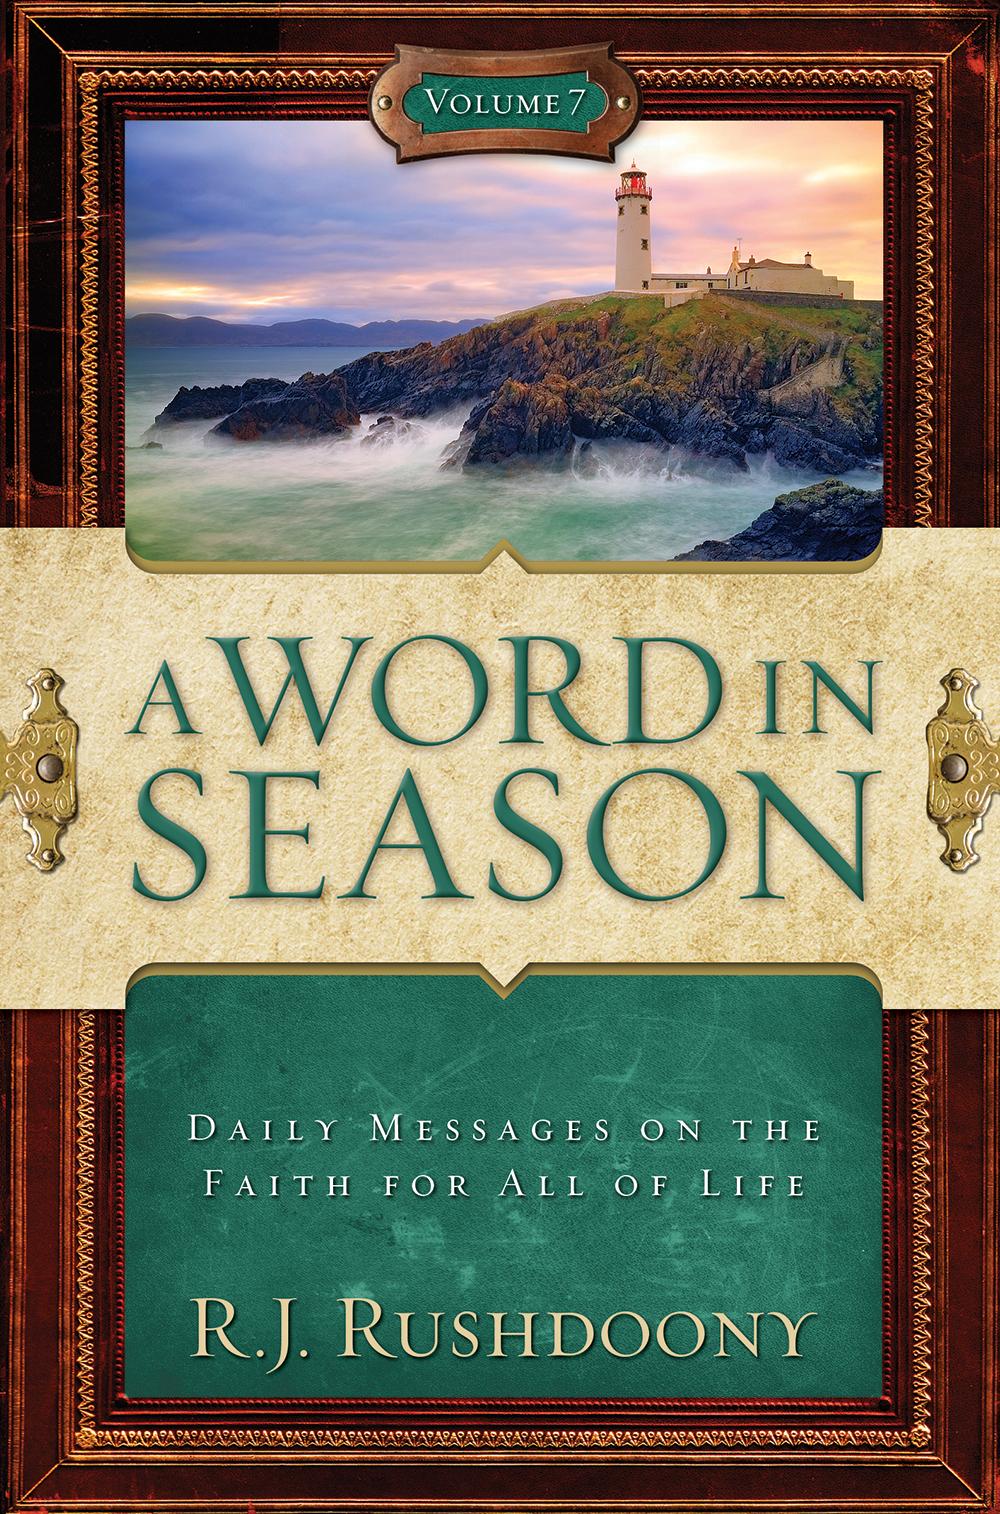 Word in Season Vol. 7, A